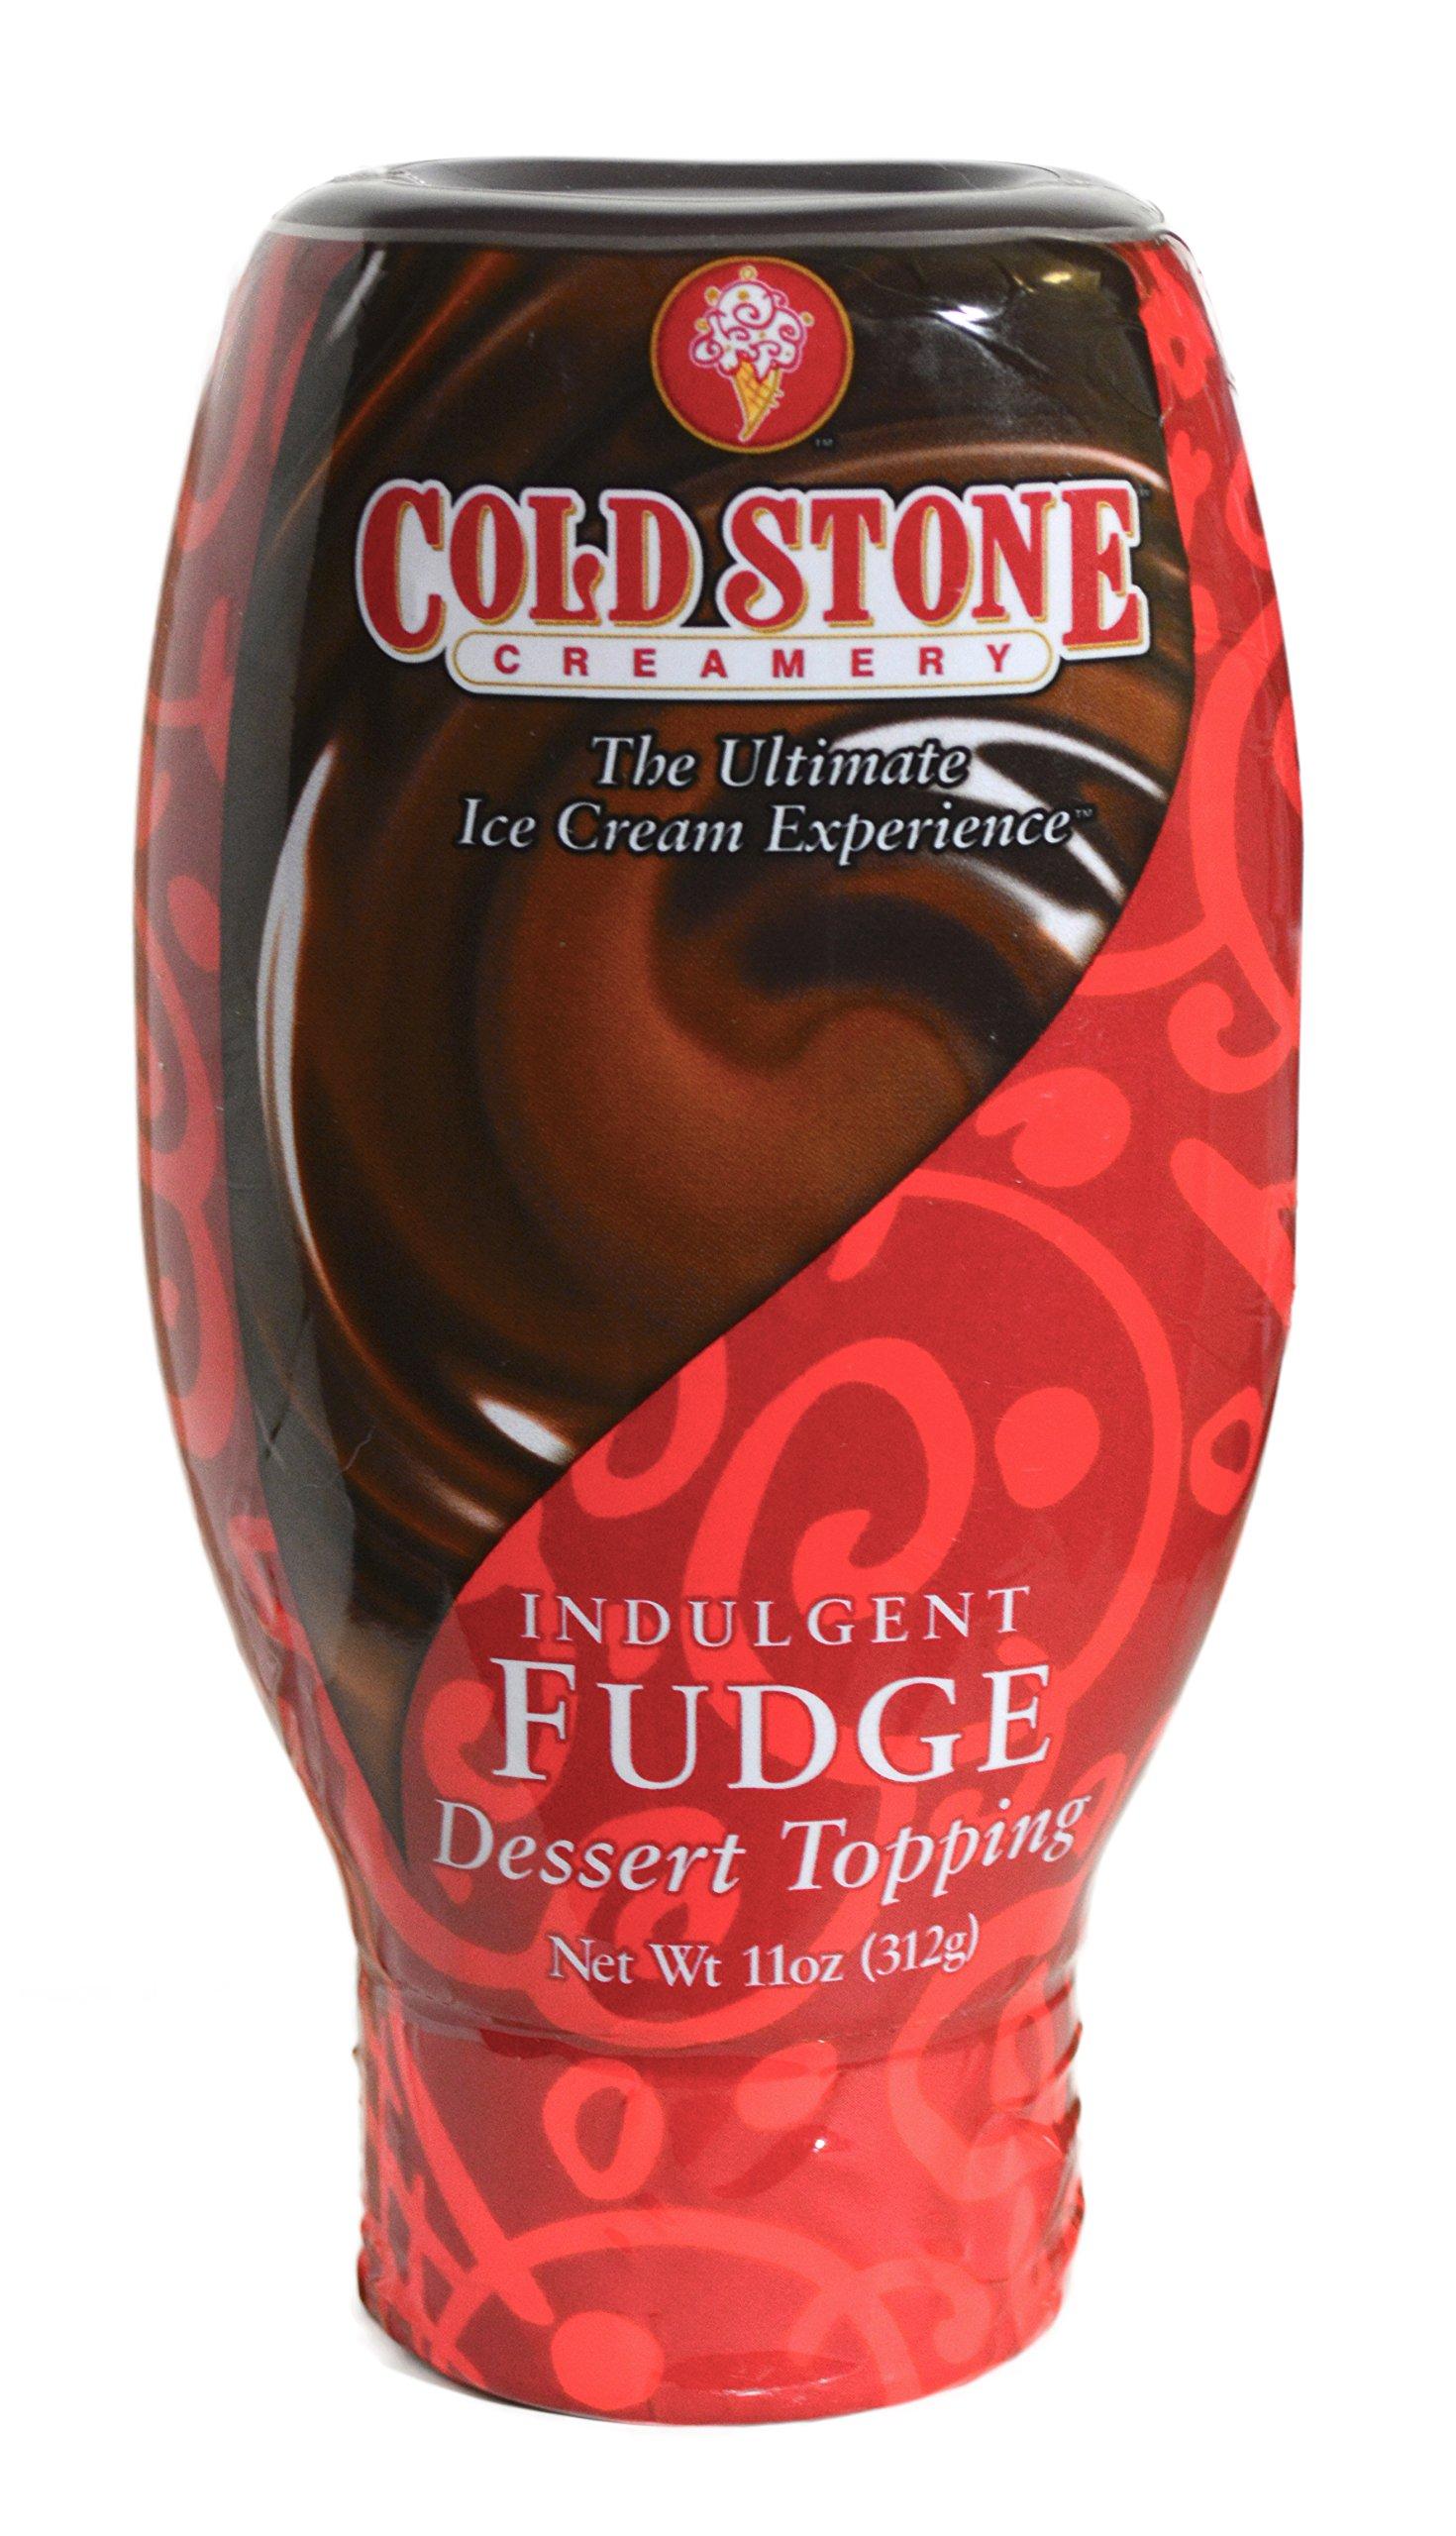 COLD STONE DESSERT TOPPER CHOCOFUDGE by Cold Stone Creamery